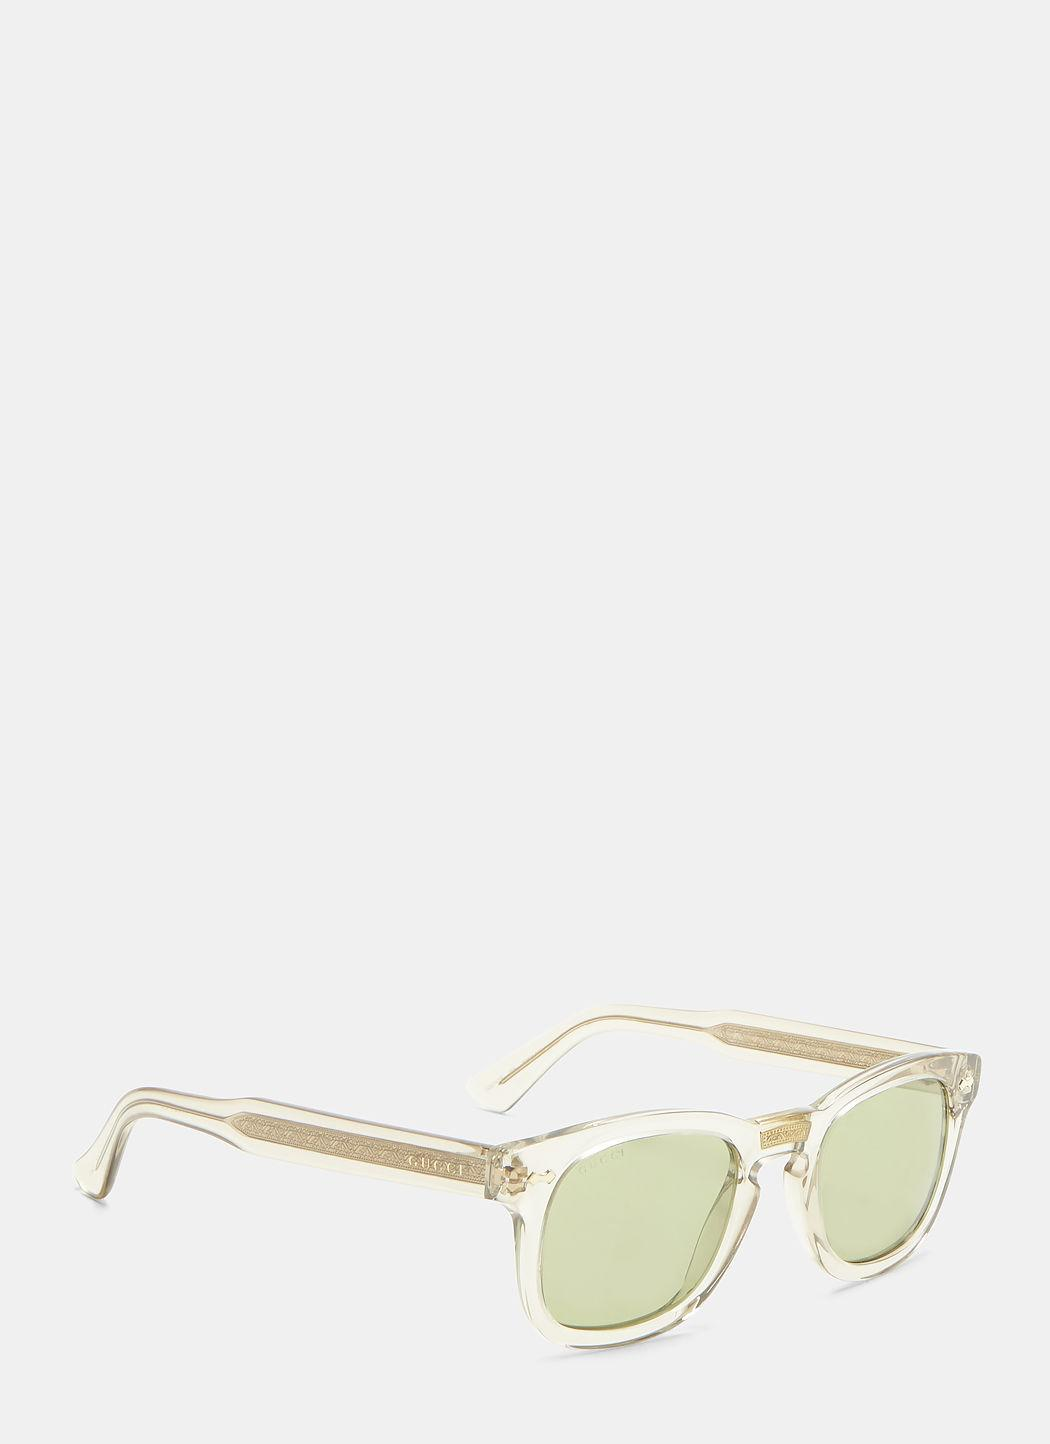 891f416881c4 Gucci Classic Transparent Square Sunglasses In Green   ModeSens